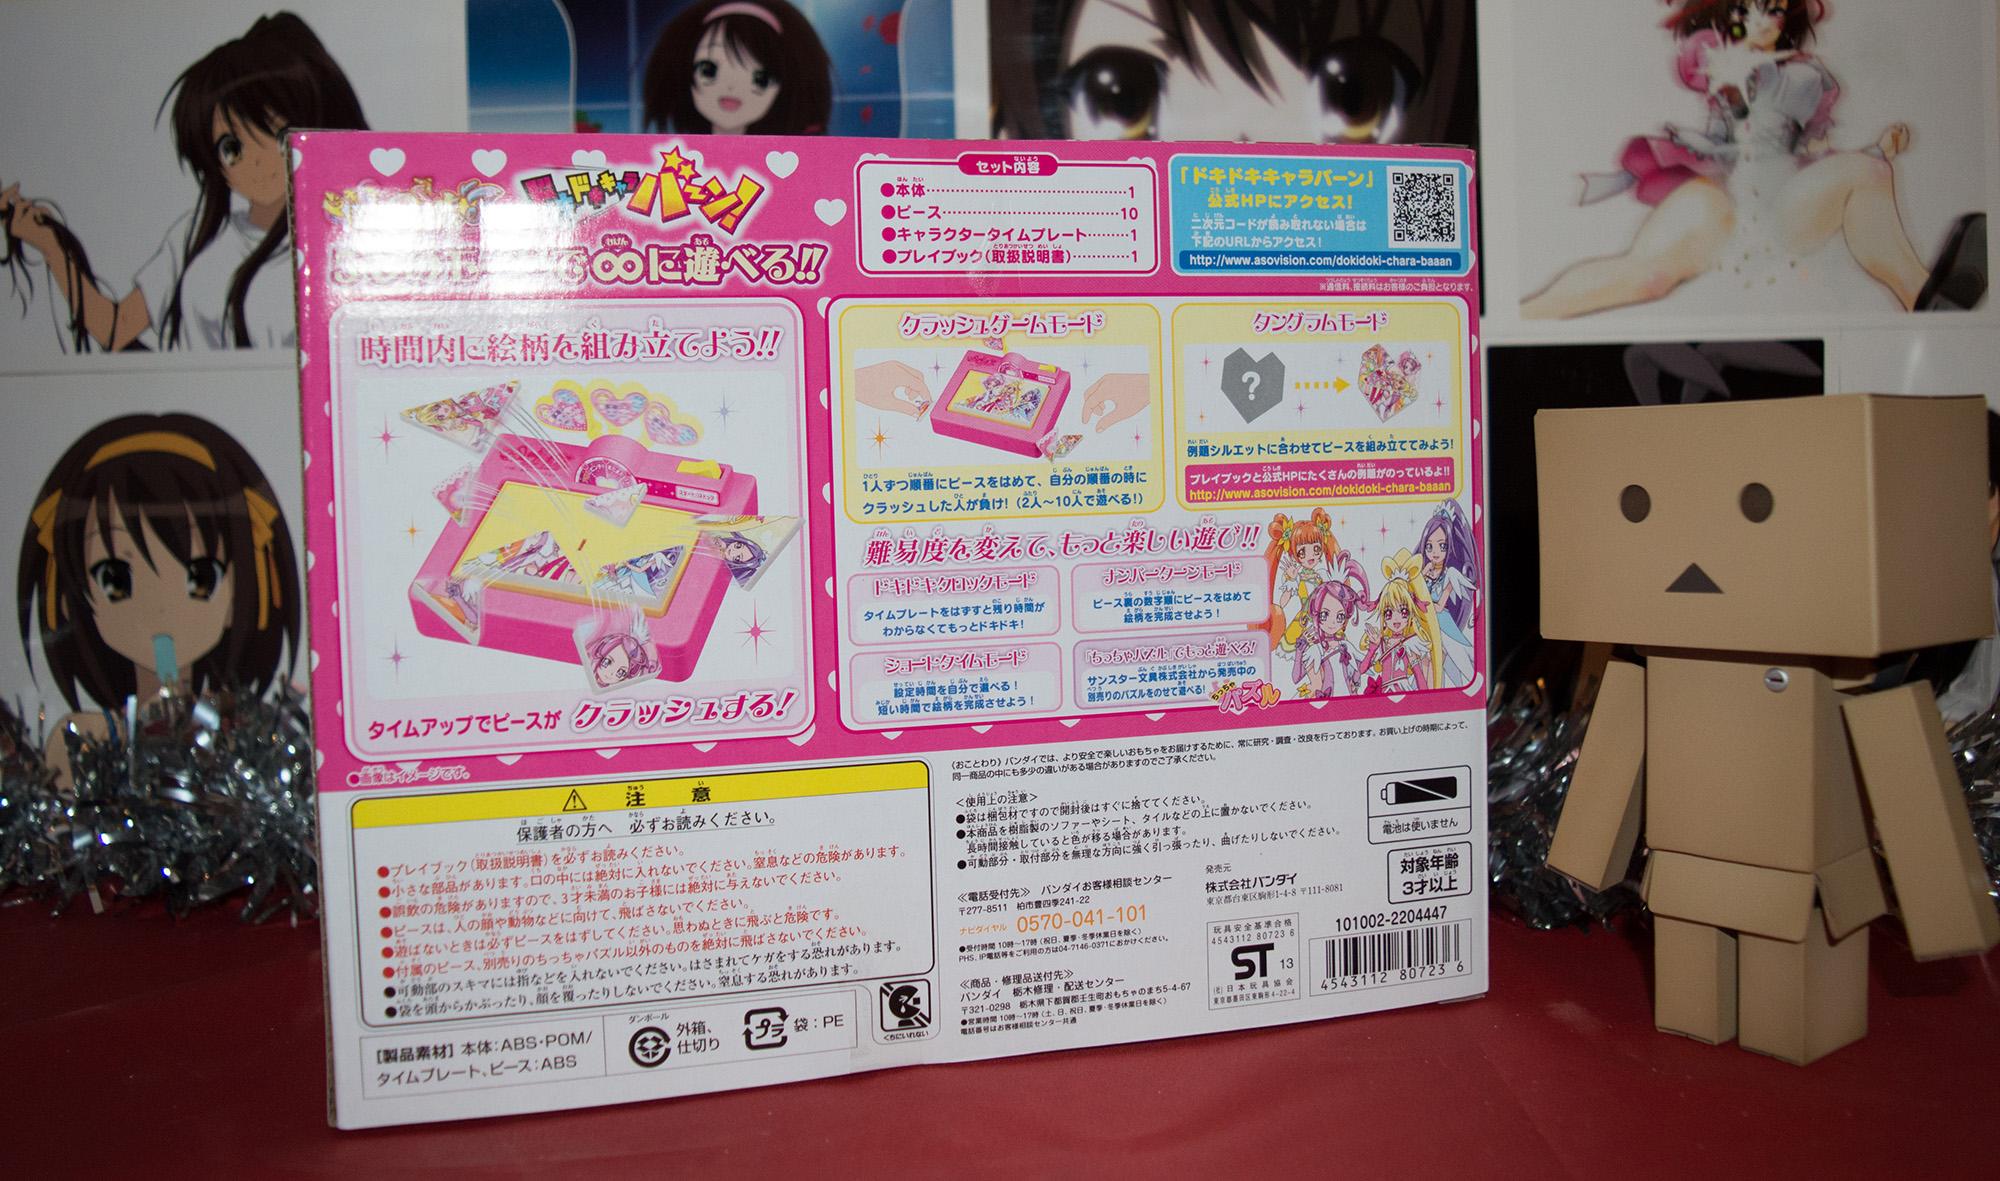 JList Fuku-Bukuro Lucky Anime Toy Set Overview haruhichan.com Dokidoki! Precure - Toy Puzzle 2